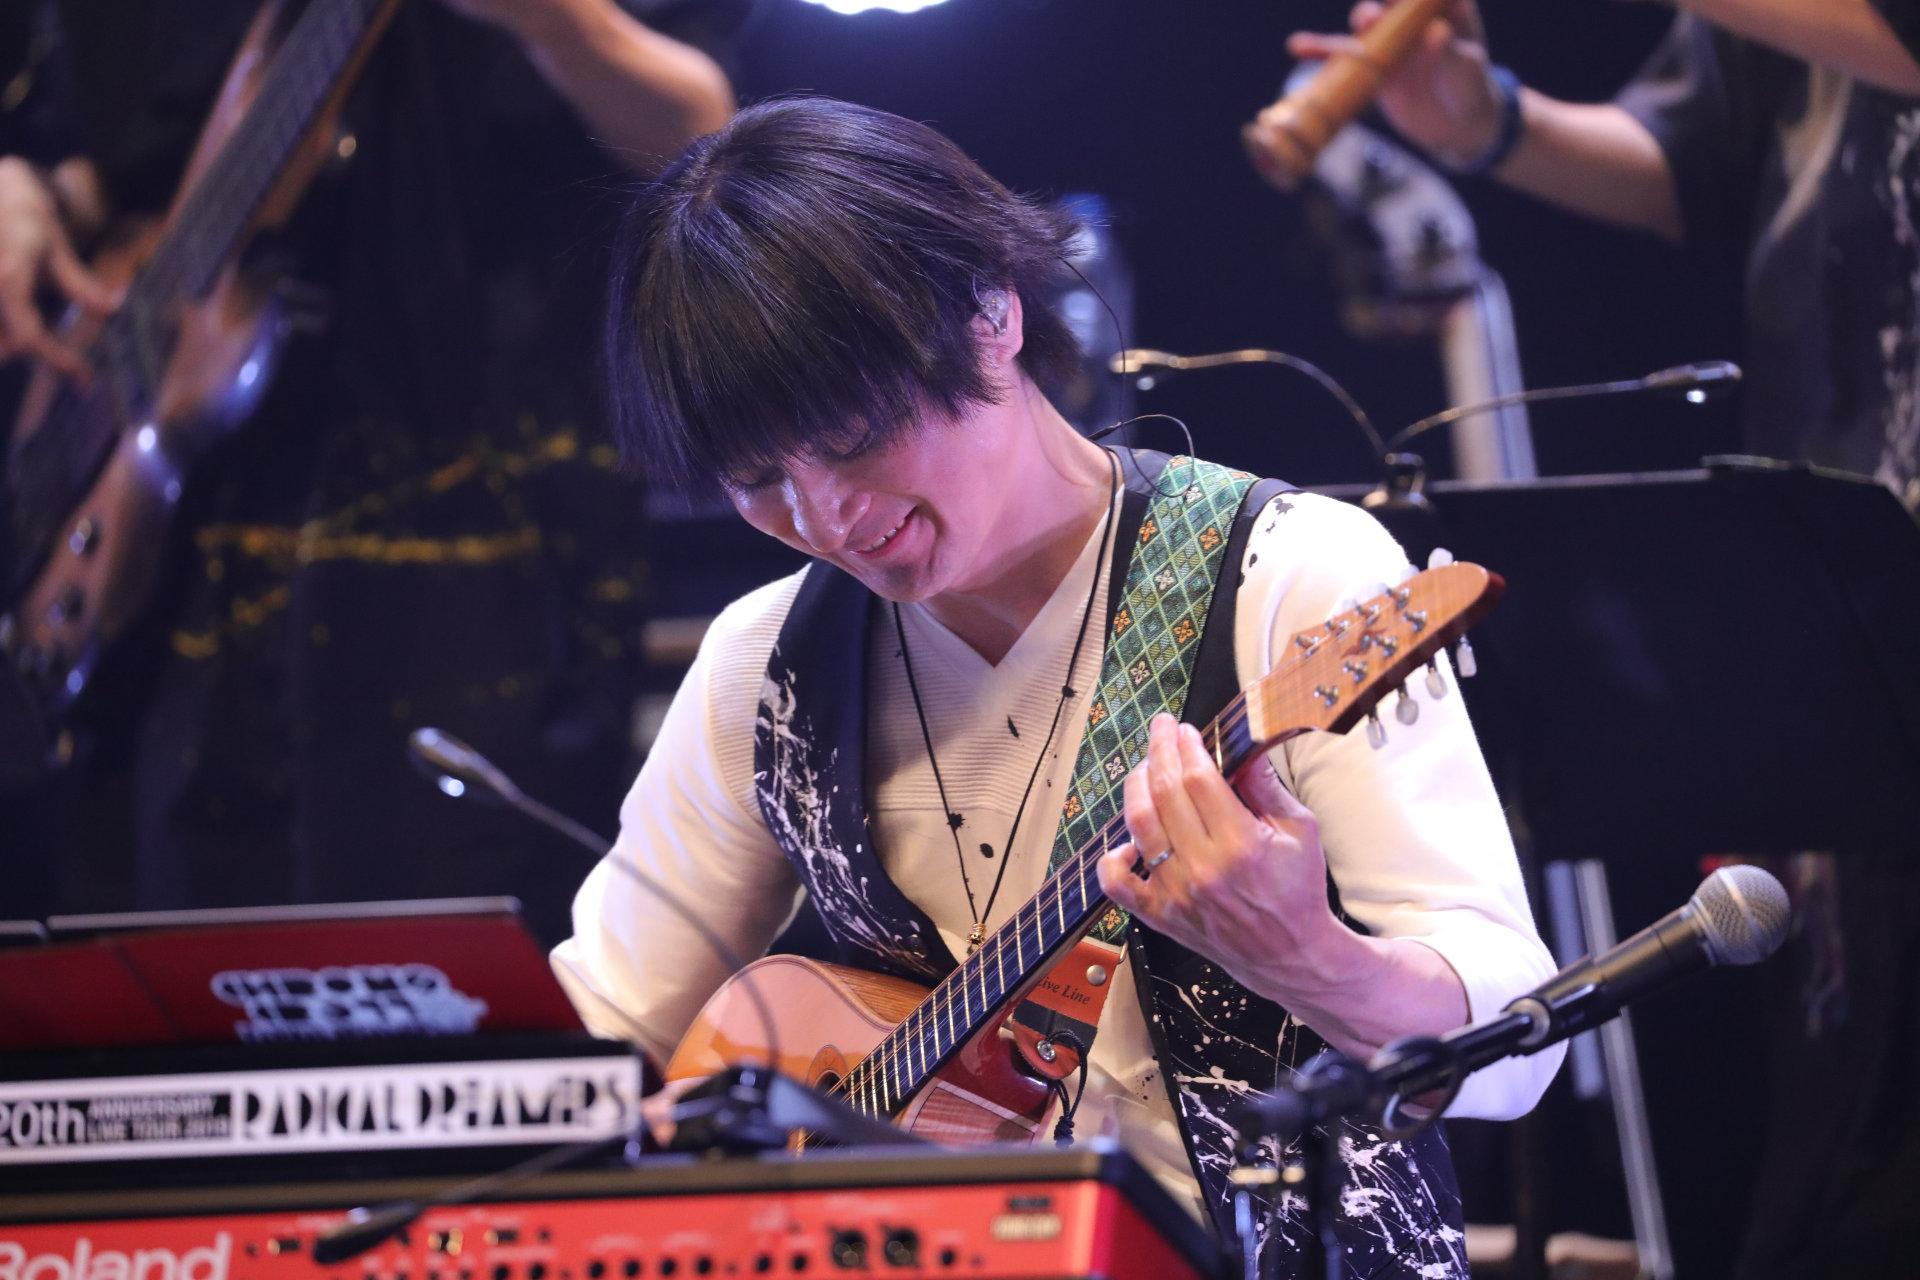 Yasunori Mitsuda playing guitar at the Chrono Cross concert.